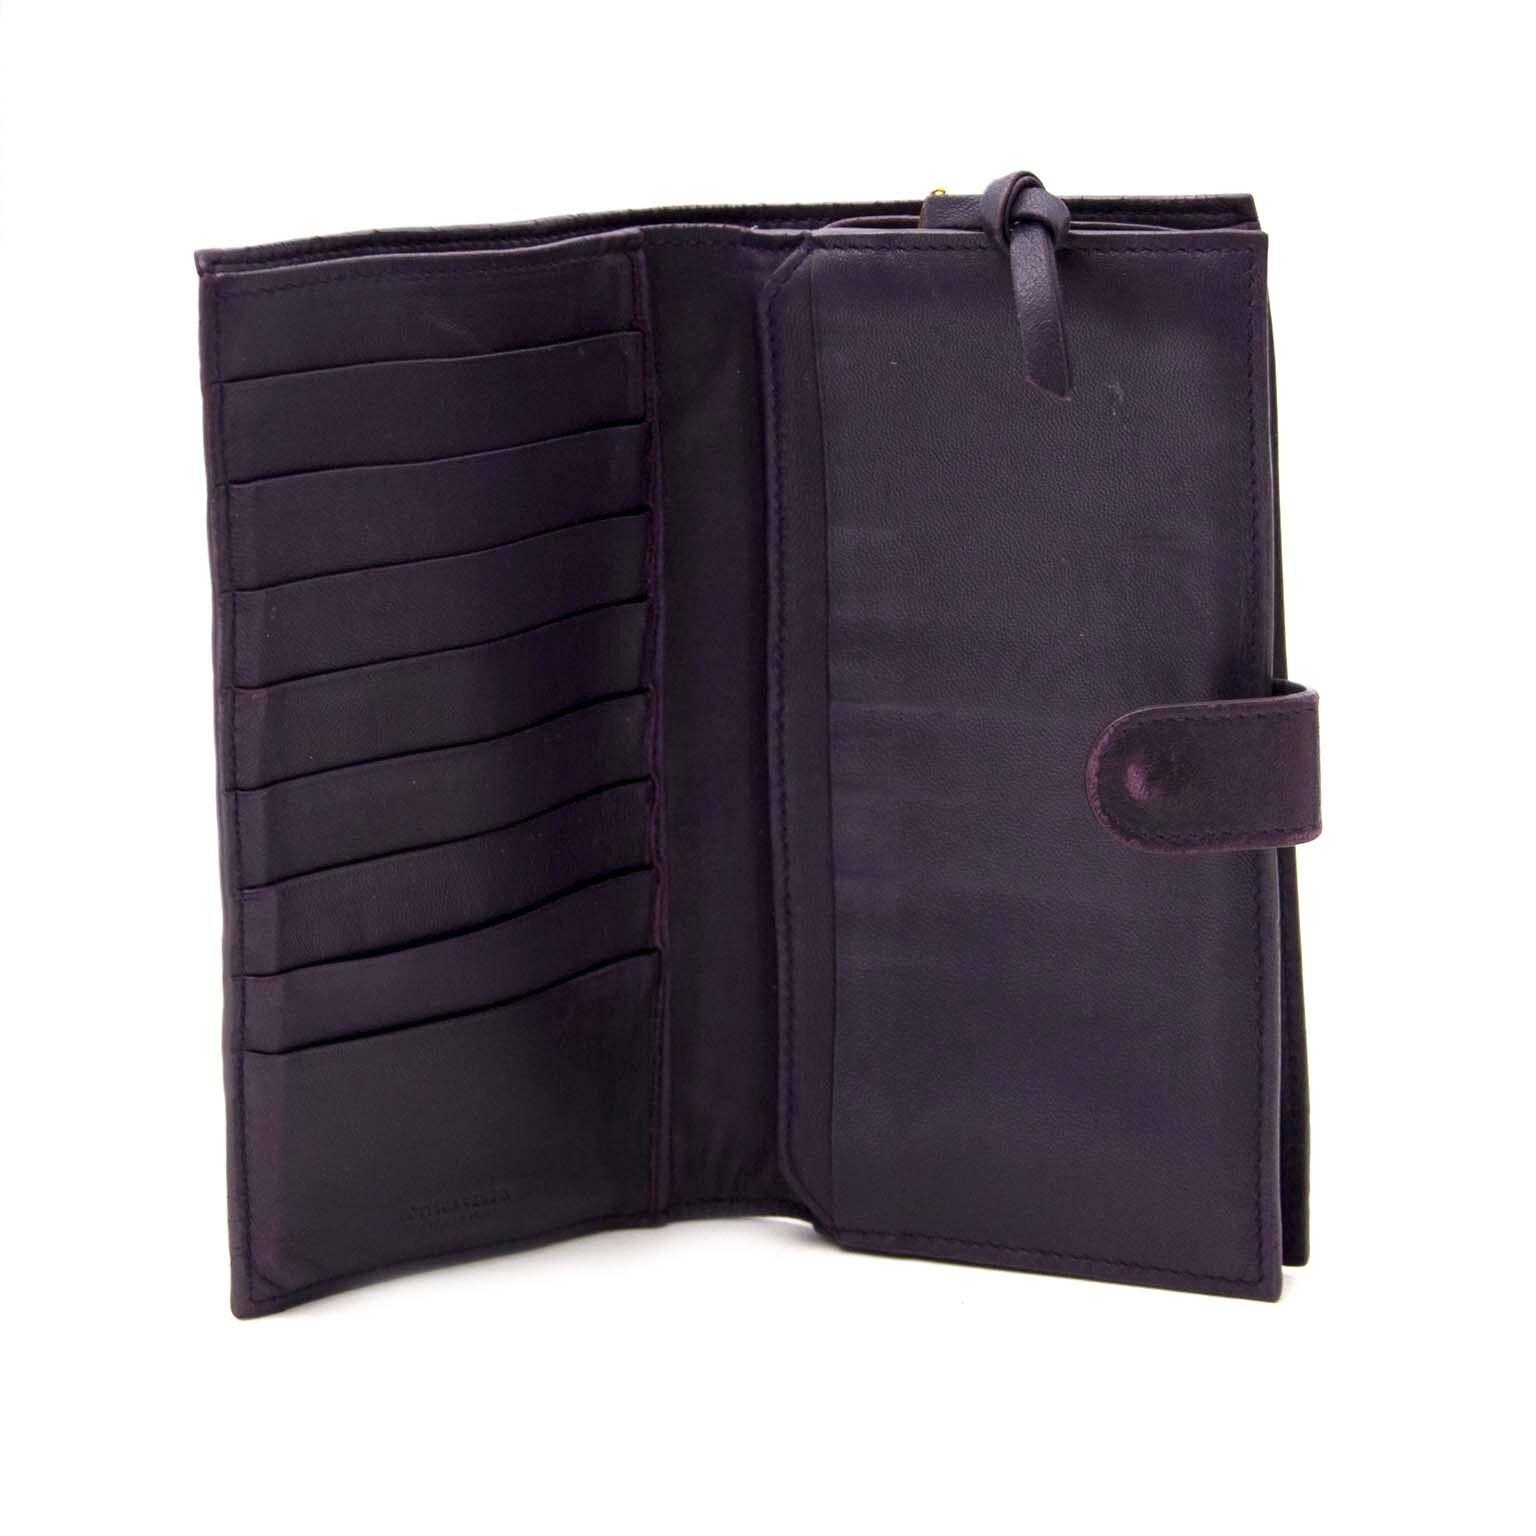 buy and sell designer items like bottega at labellov